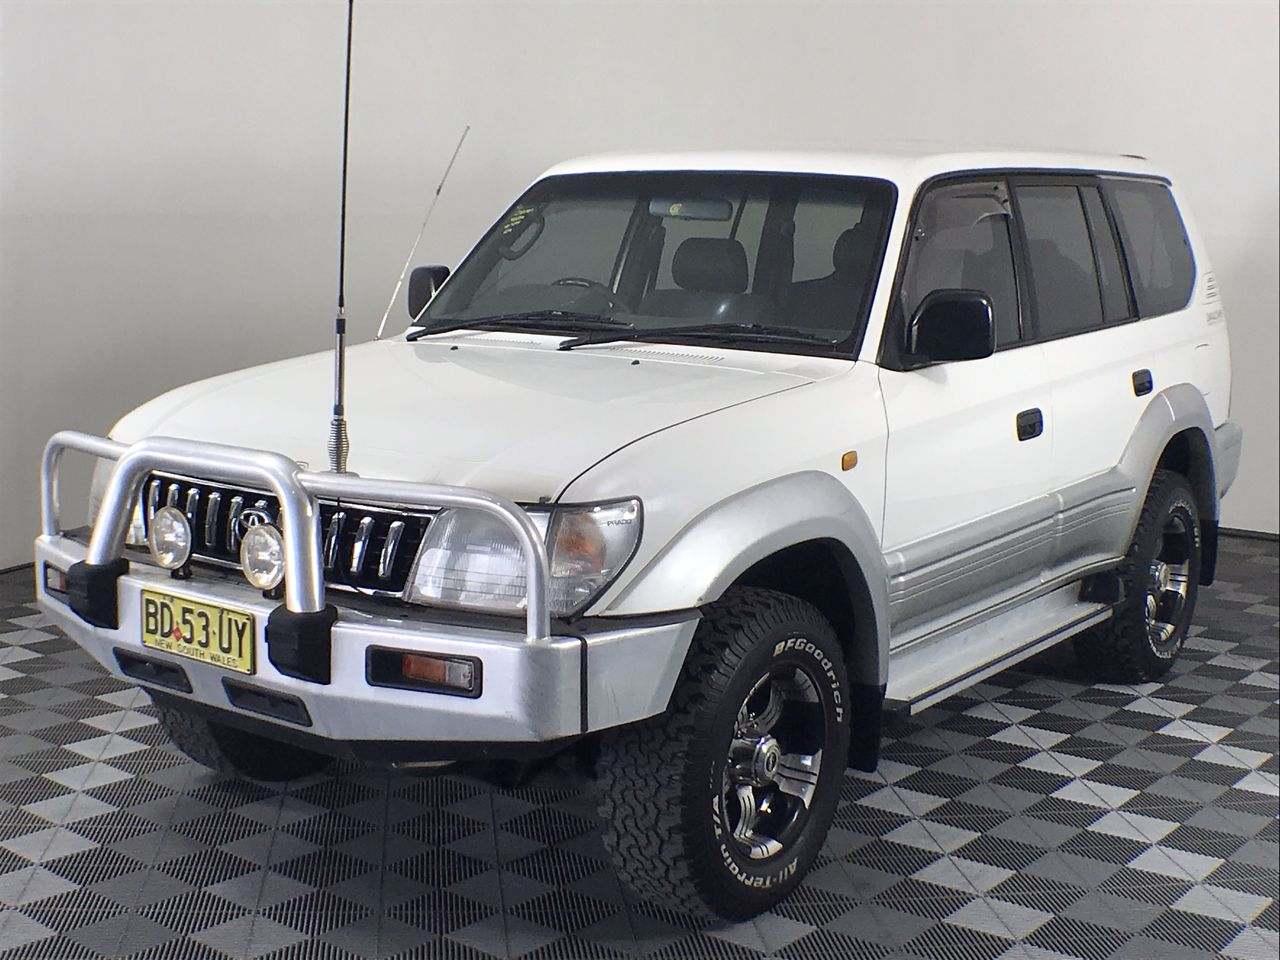 1998 Toyota Landcruiser Prado GXL (4x4) VZJ95R Automatic 8 Seats Wagon